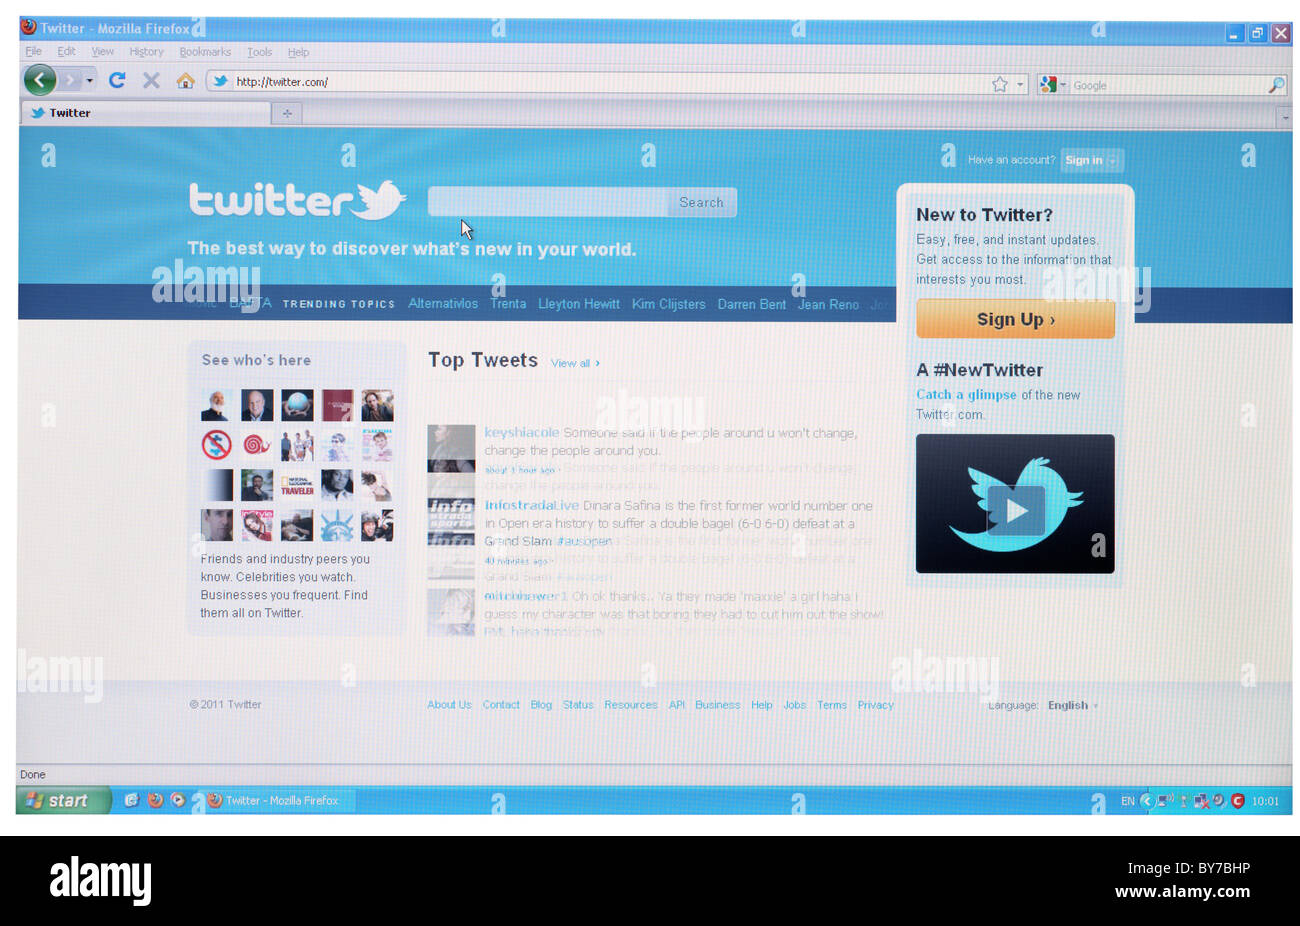 Vollständigen Screenshot der Homepage des social-networking-Website Twitter.com Stockbild